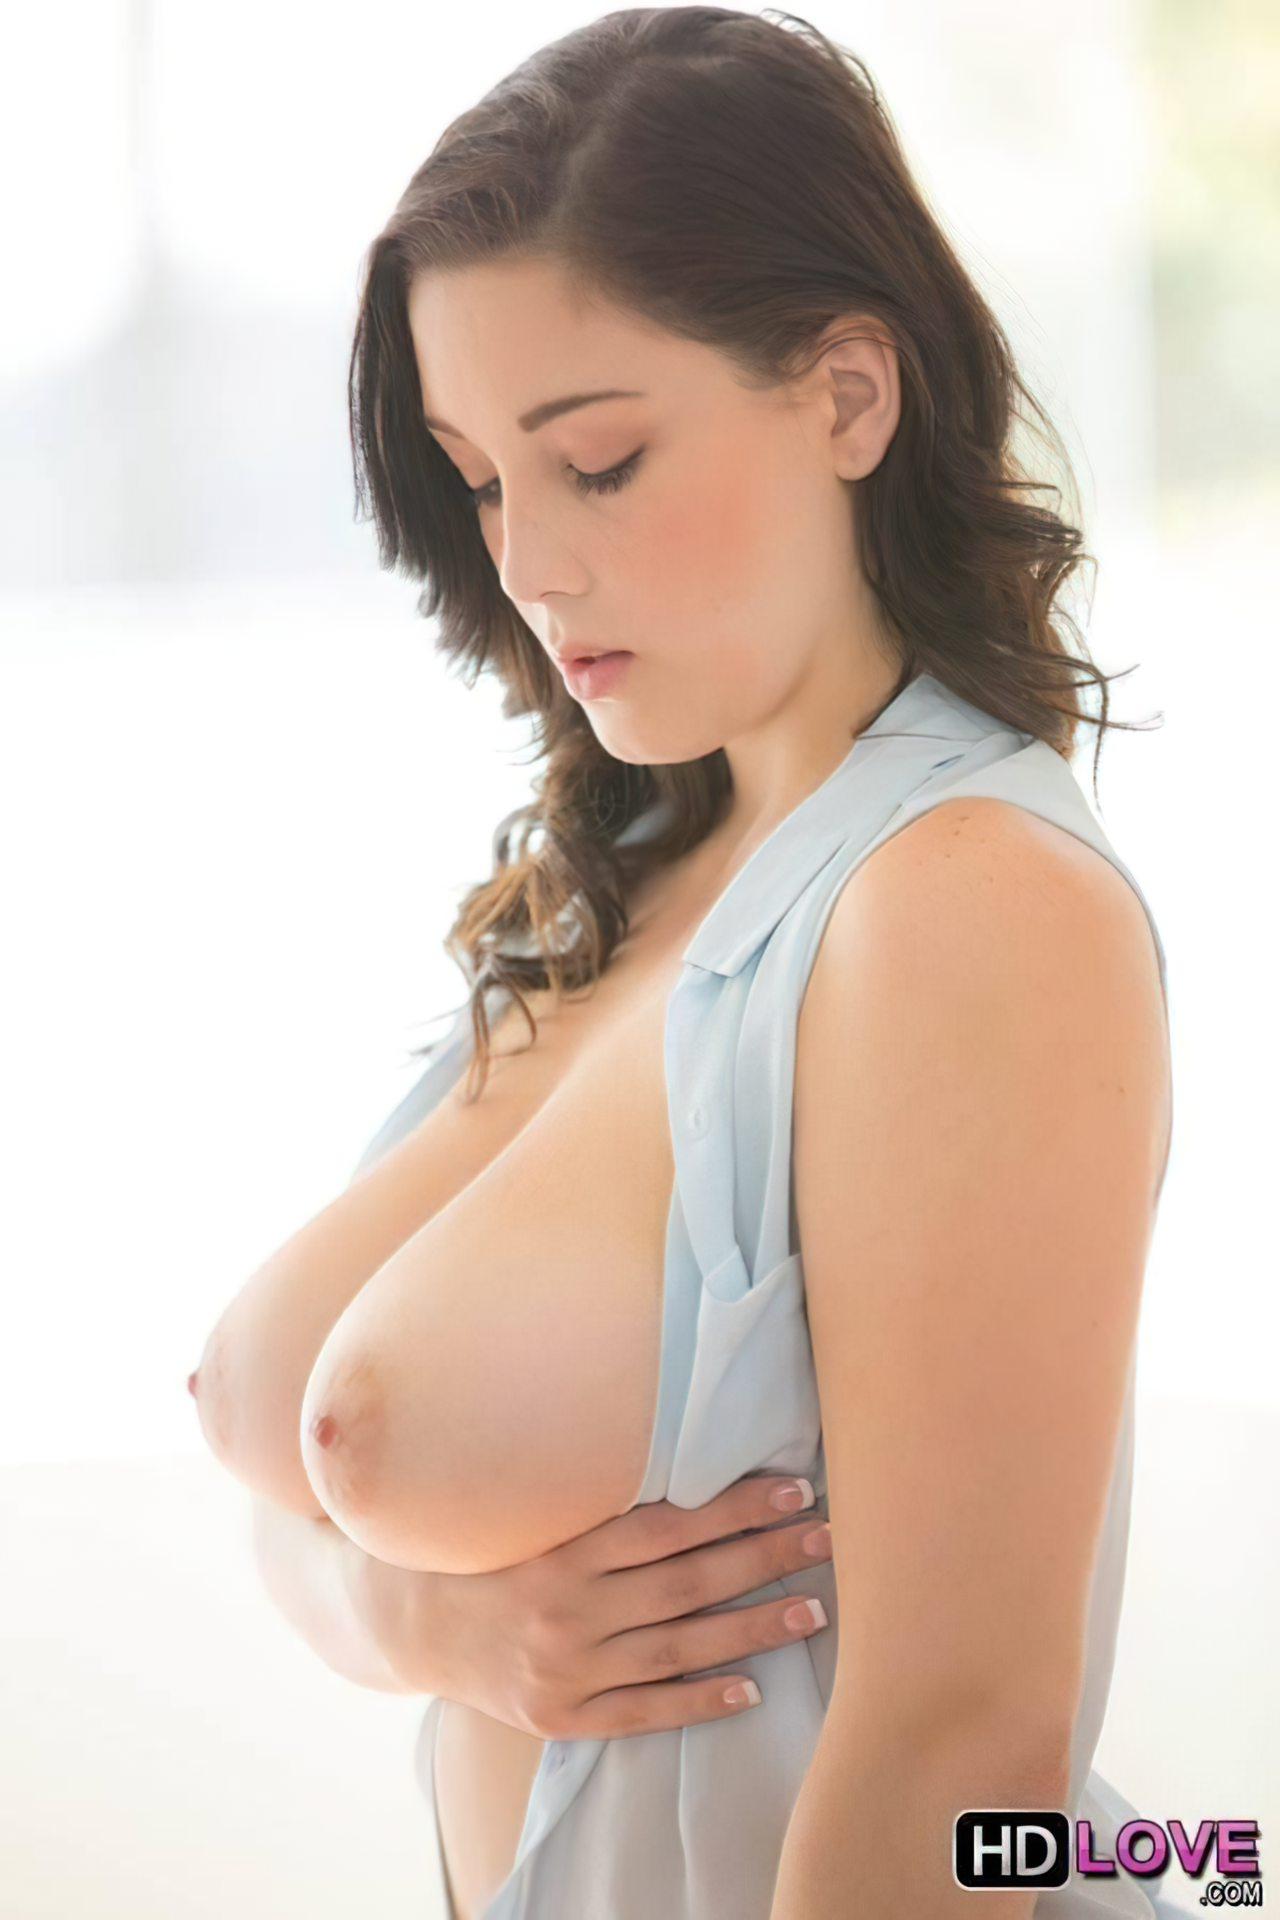 Moças Nuas (43)